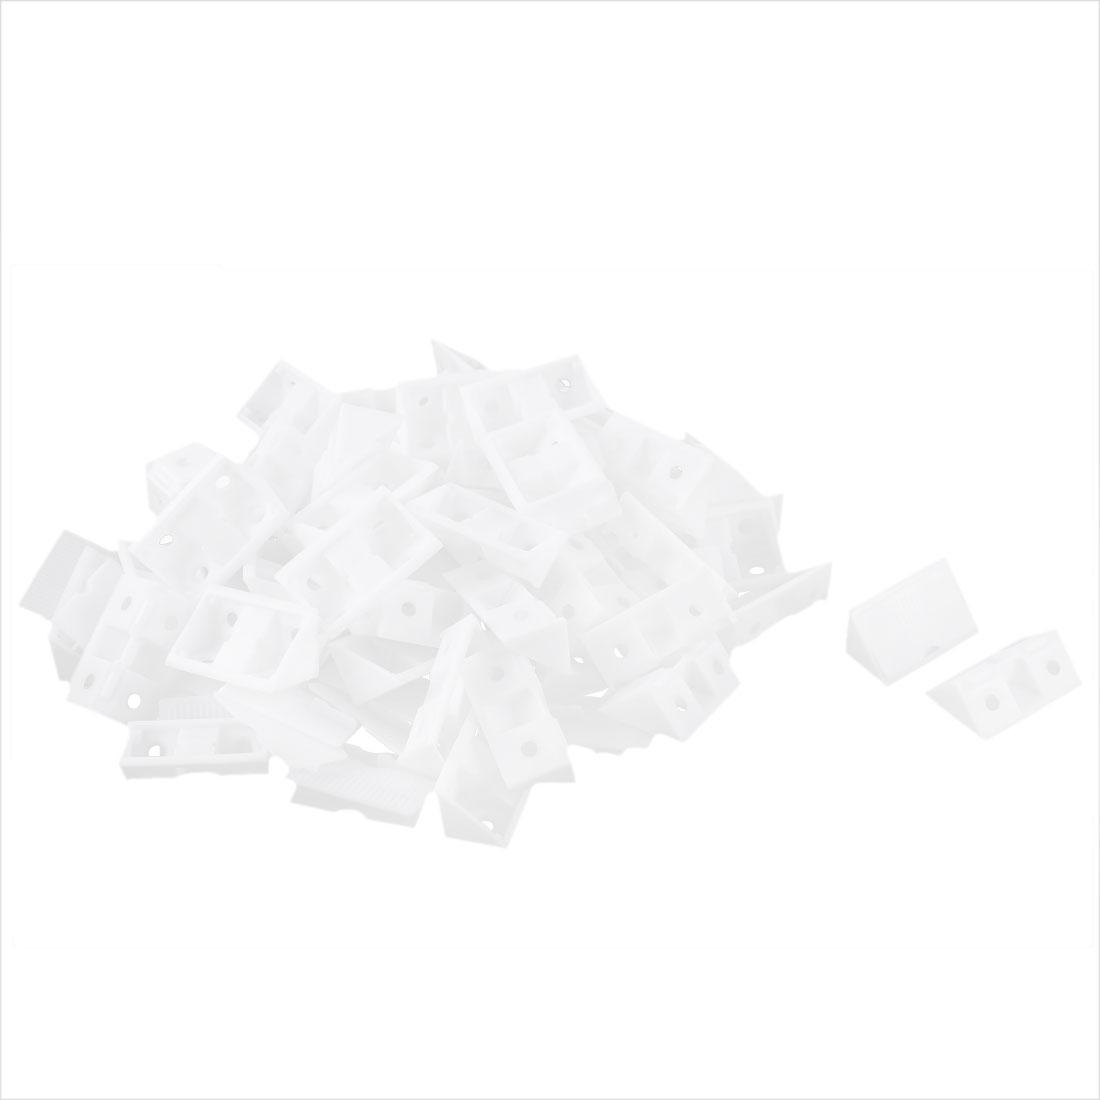 Furniture Shelf Plastic 90 Degree Angle Brackets White 50pcs